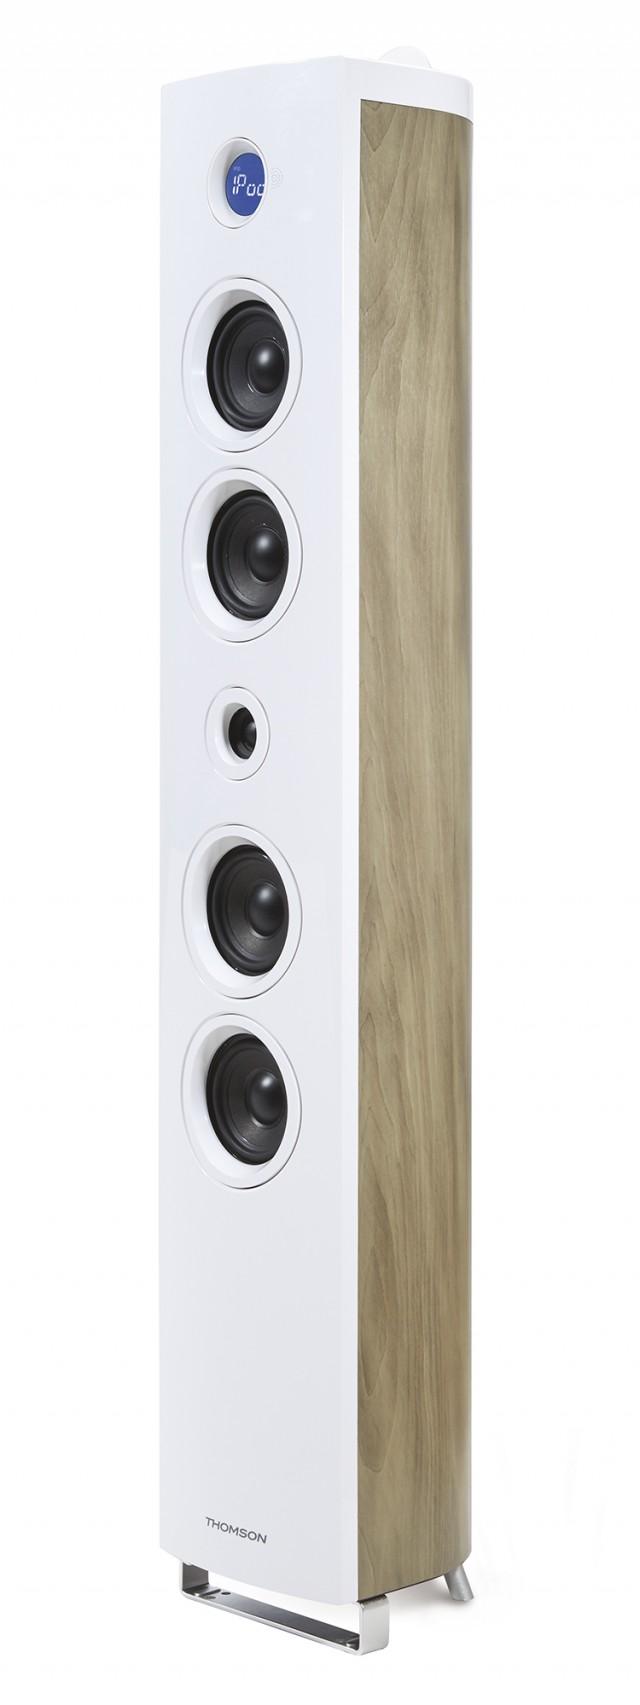 Multimedia Tower 'Wood' (White) - Packshot